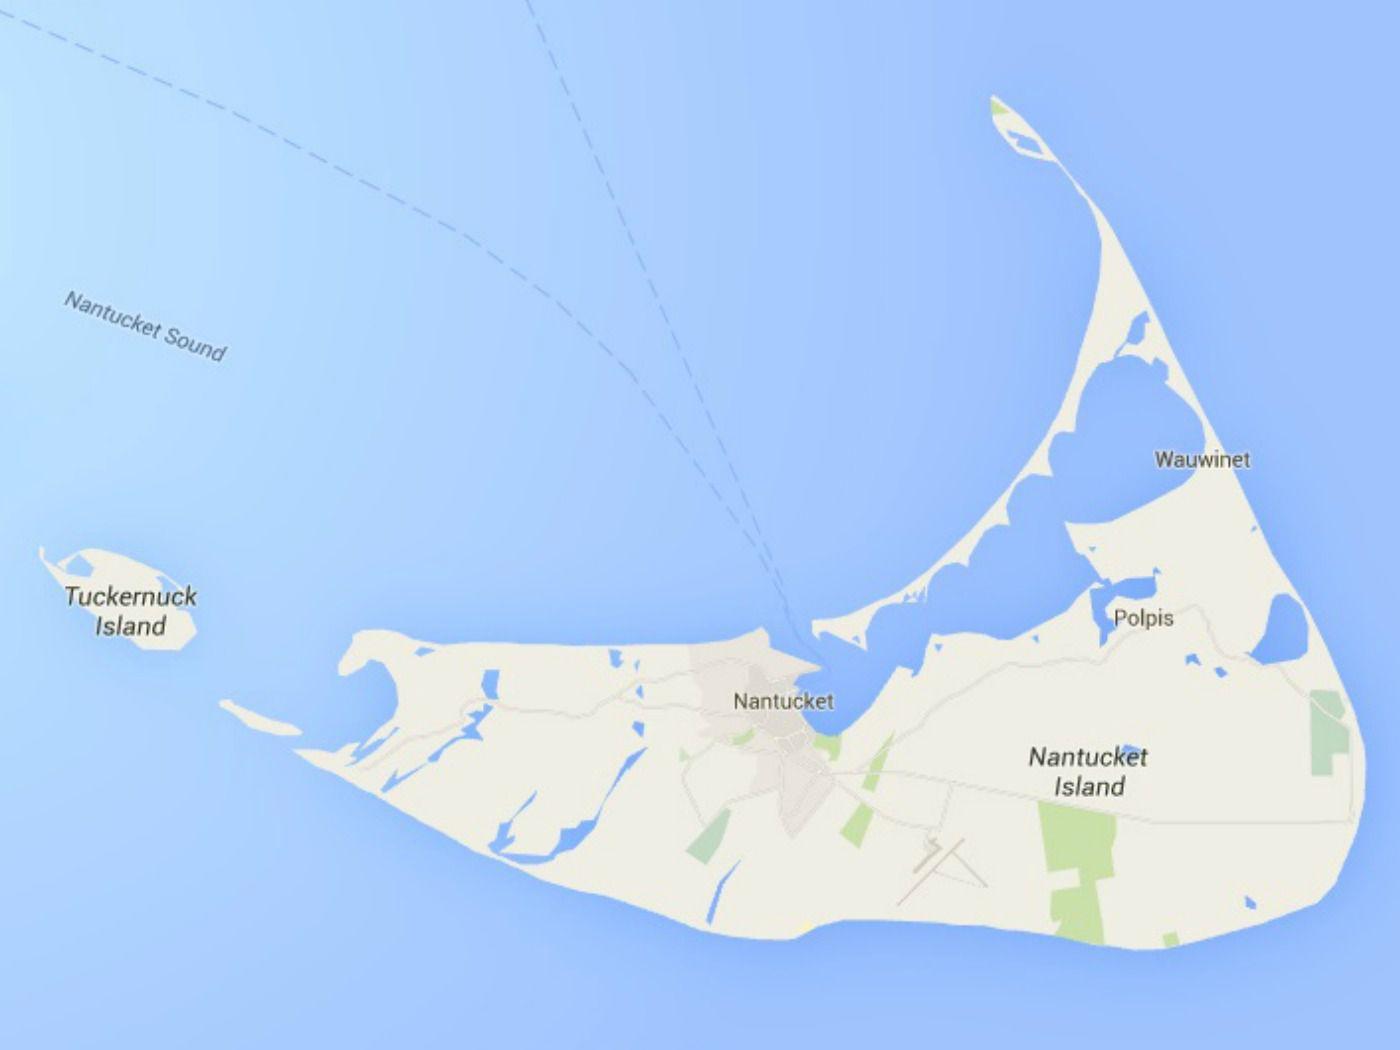 Map Of Nantucket Maps of Cape Cod, Martha's Vineyard, and Nantucket Map Of Nantucket